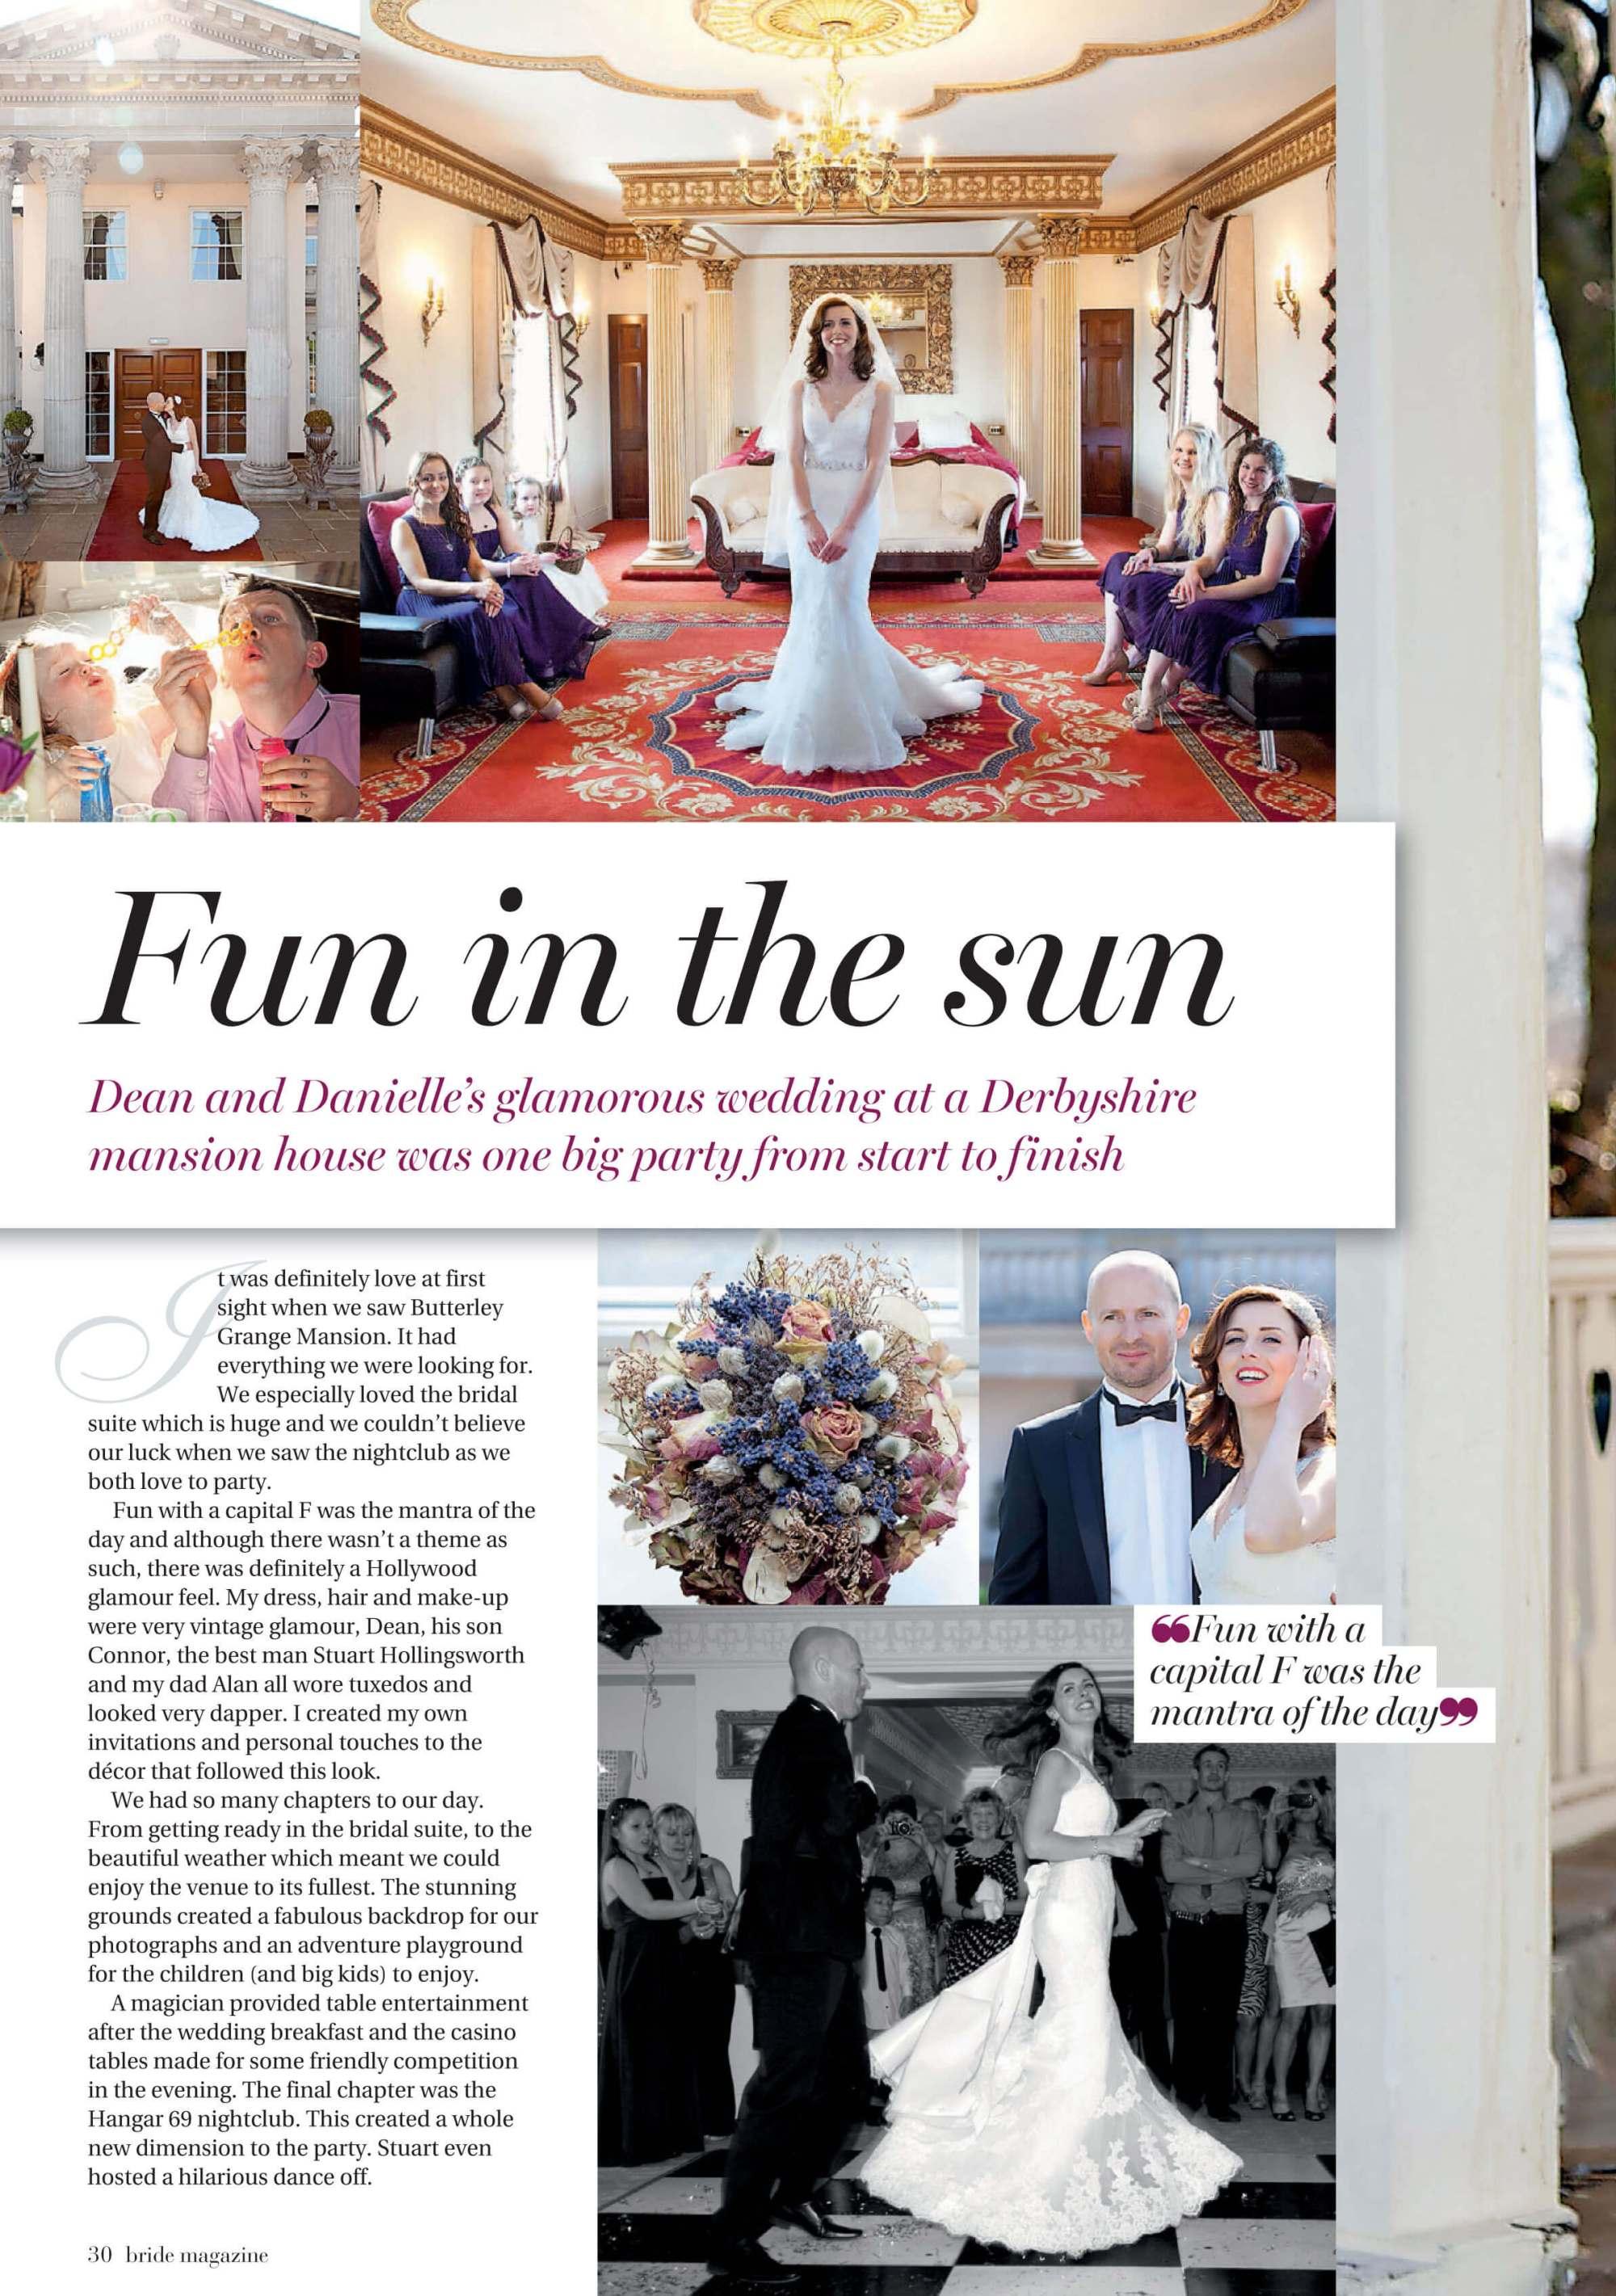 Midlands-Bride-Danielle-Dean-page-1B